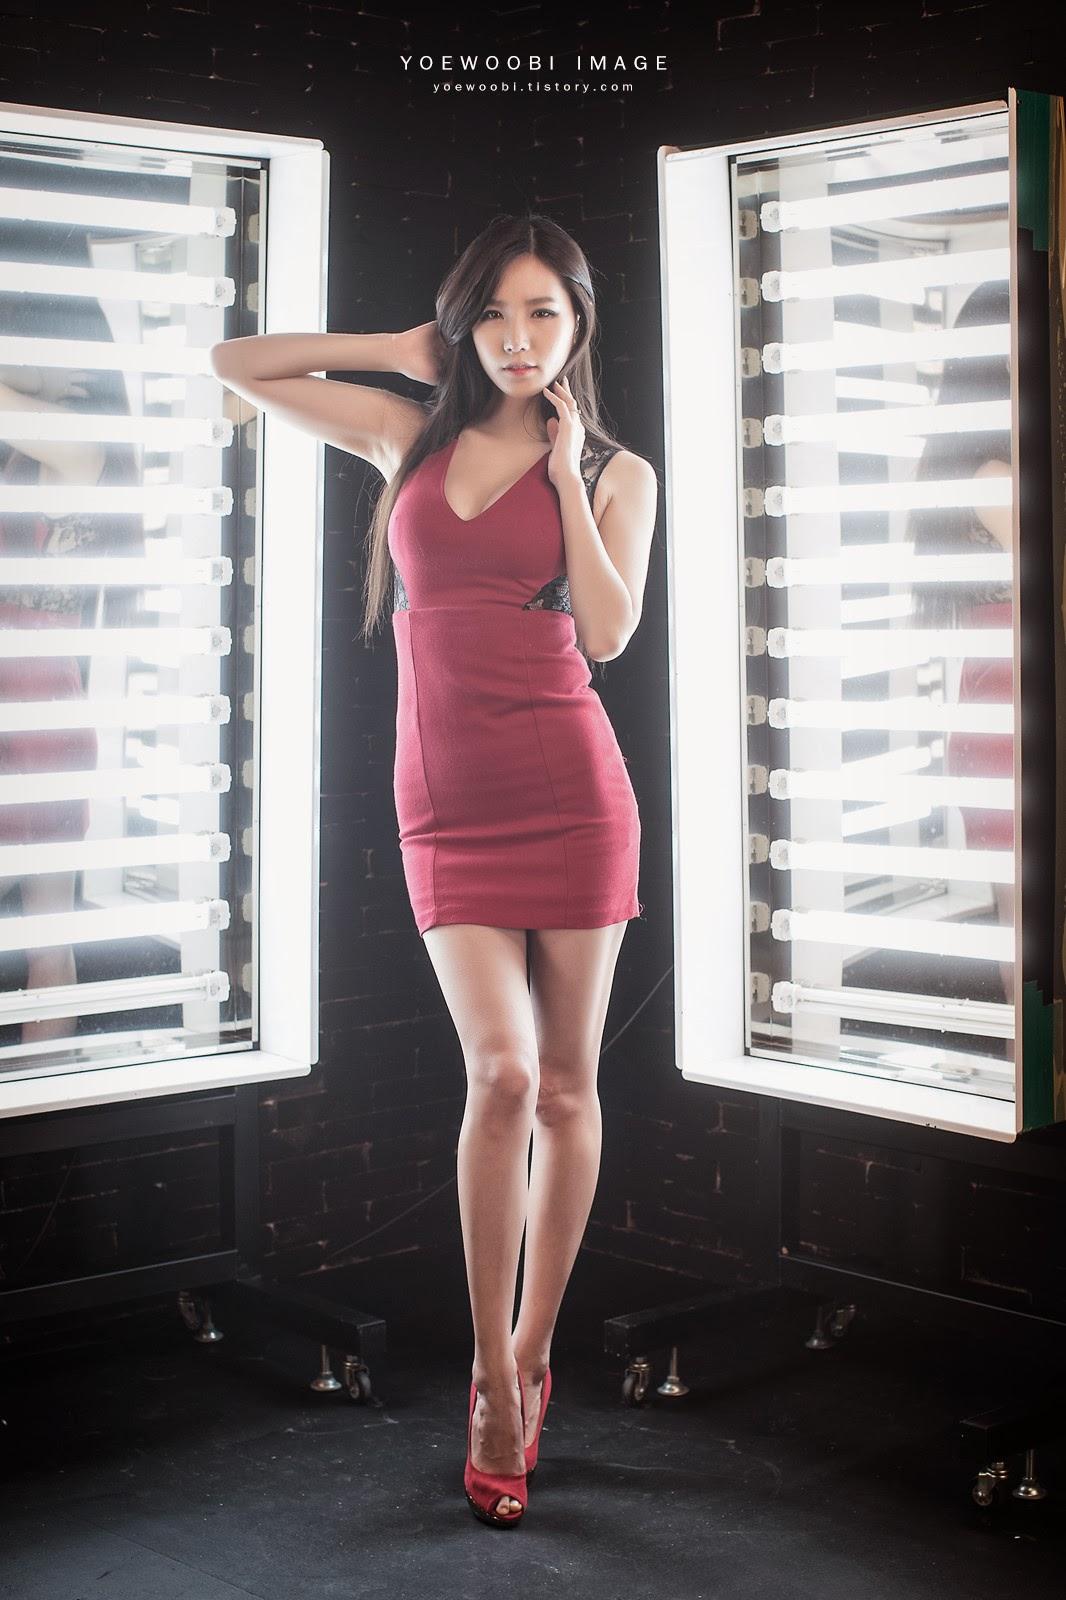 5 Lee Ji Min - very cute asian girl-girlcute4u.blogspot.com